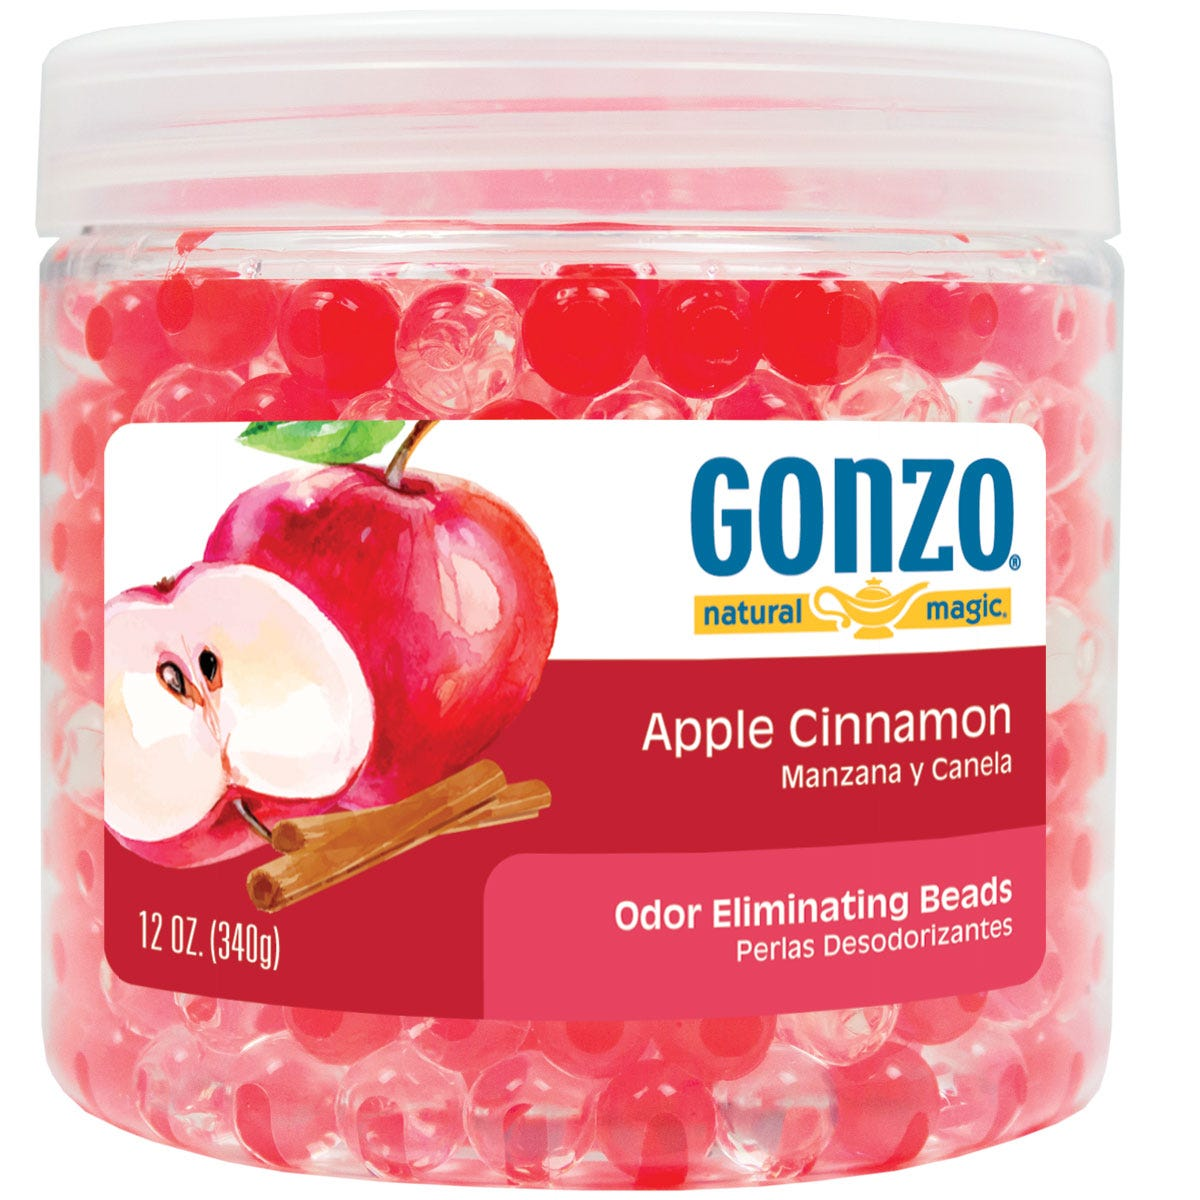 https://googone.com/media/catalog/product/a/p/apple-cinnamon-odor-eliminating-beads_front.jpg